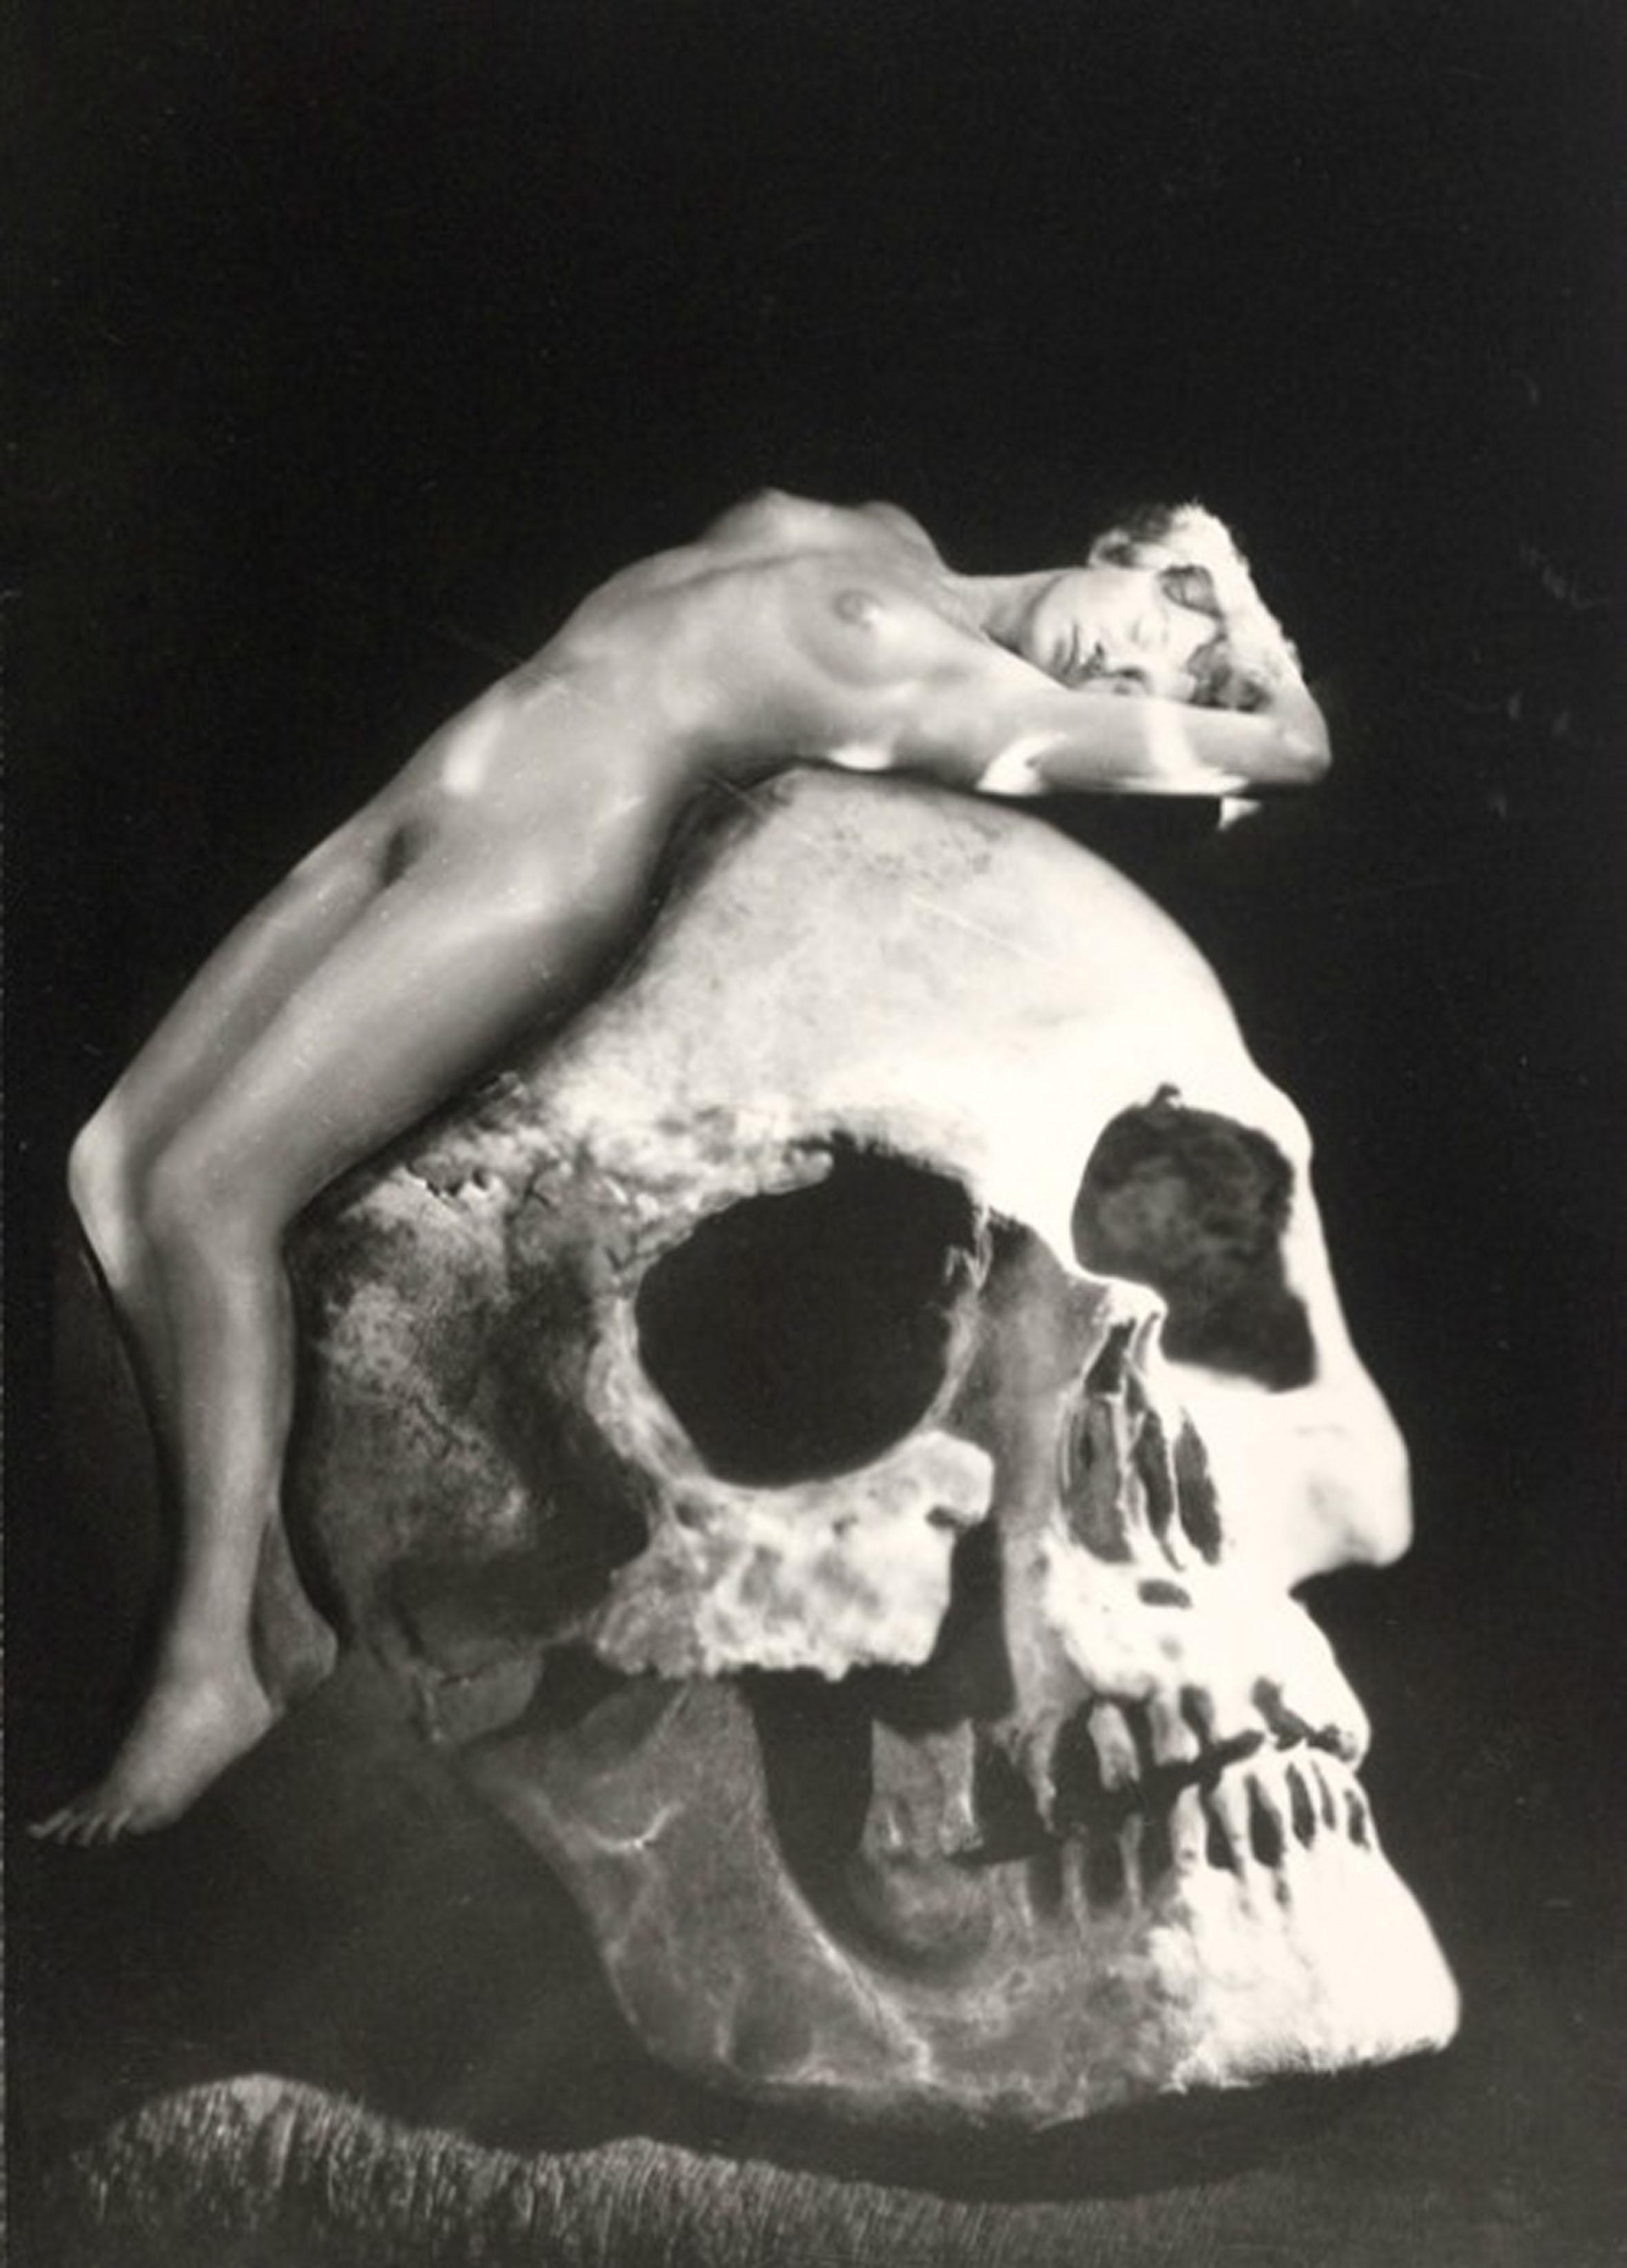 from Nehemiah vintage erotic photo naked women